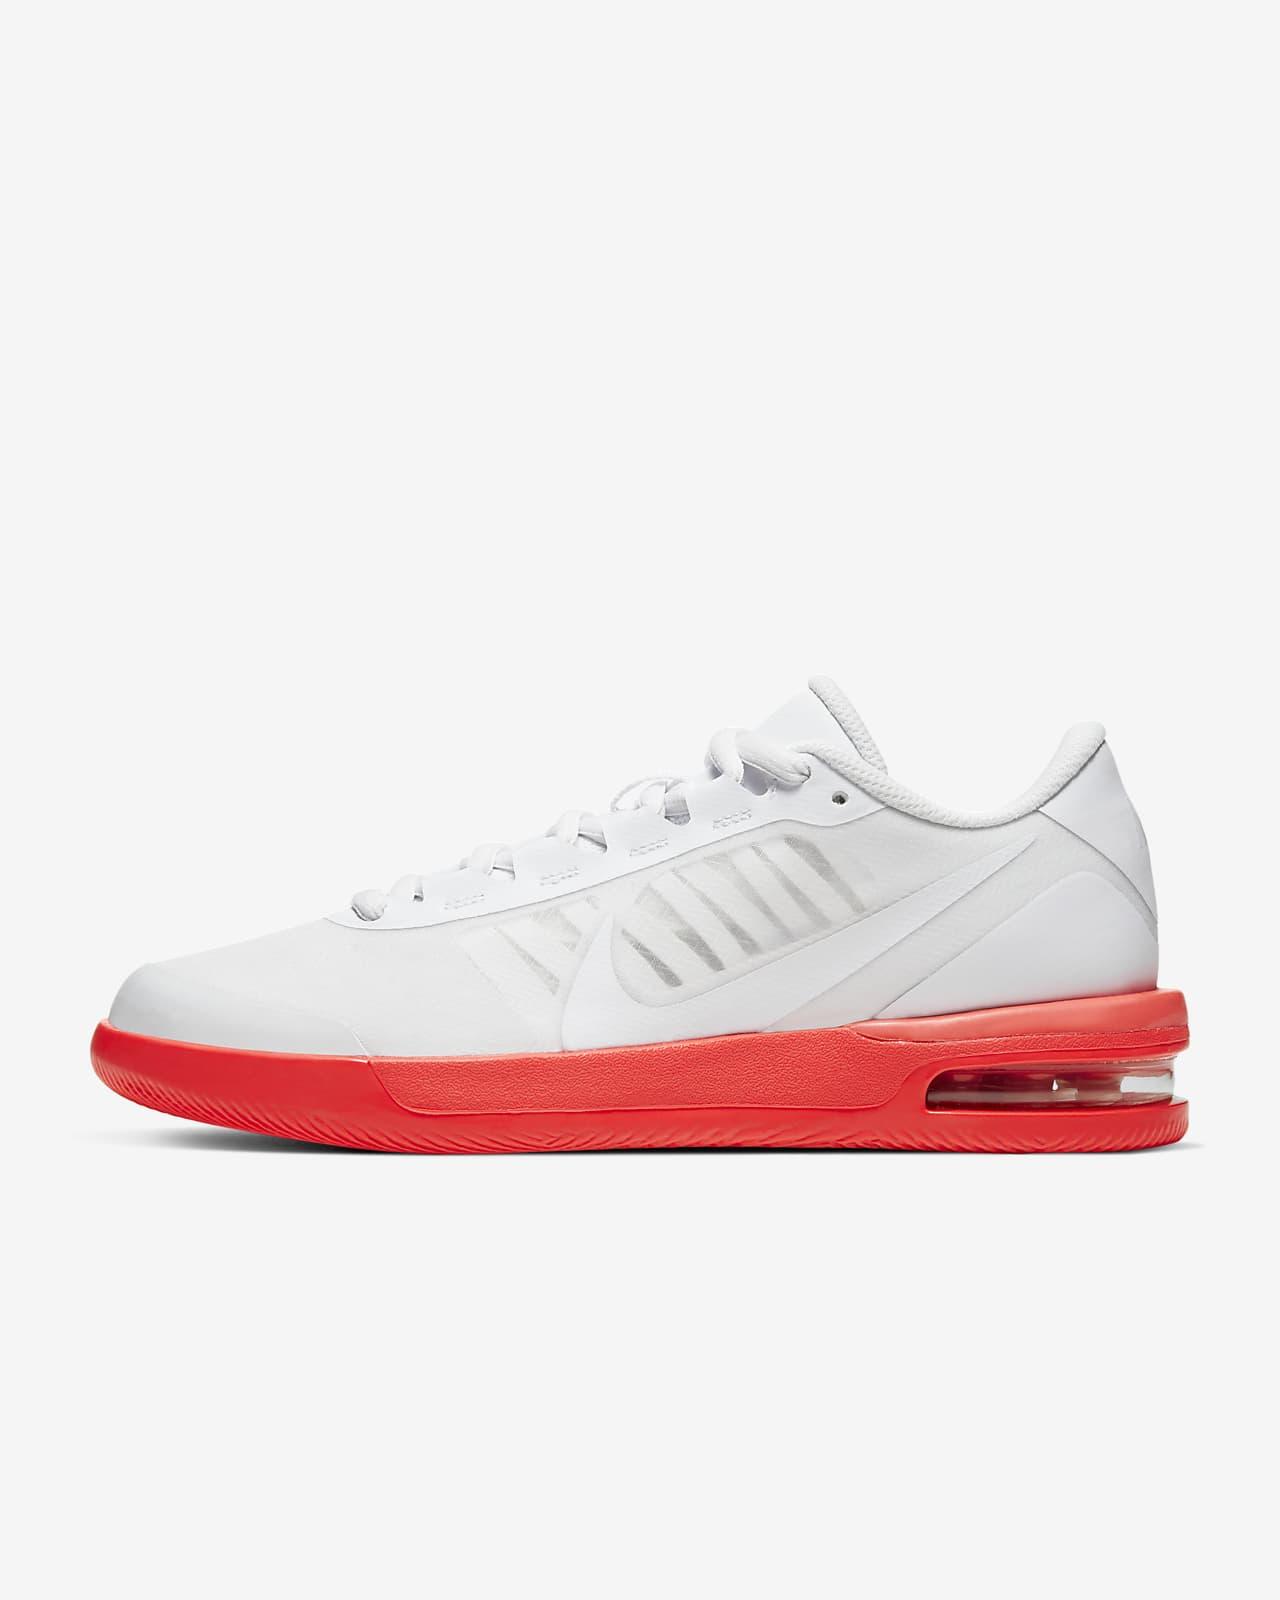 NikeCourt Air Max Vapor Wing MS női teniszcipő